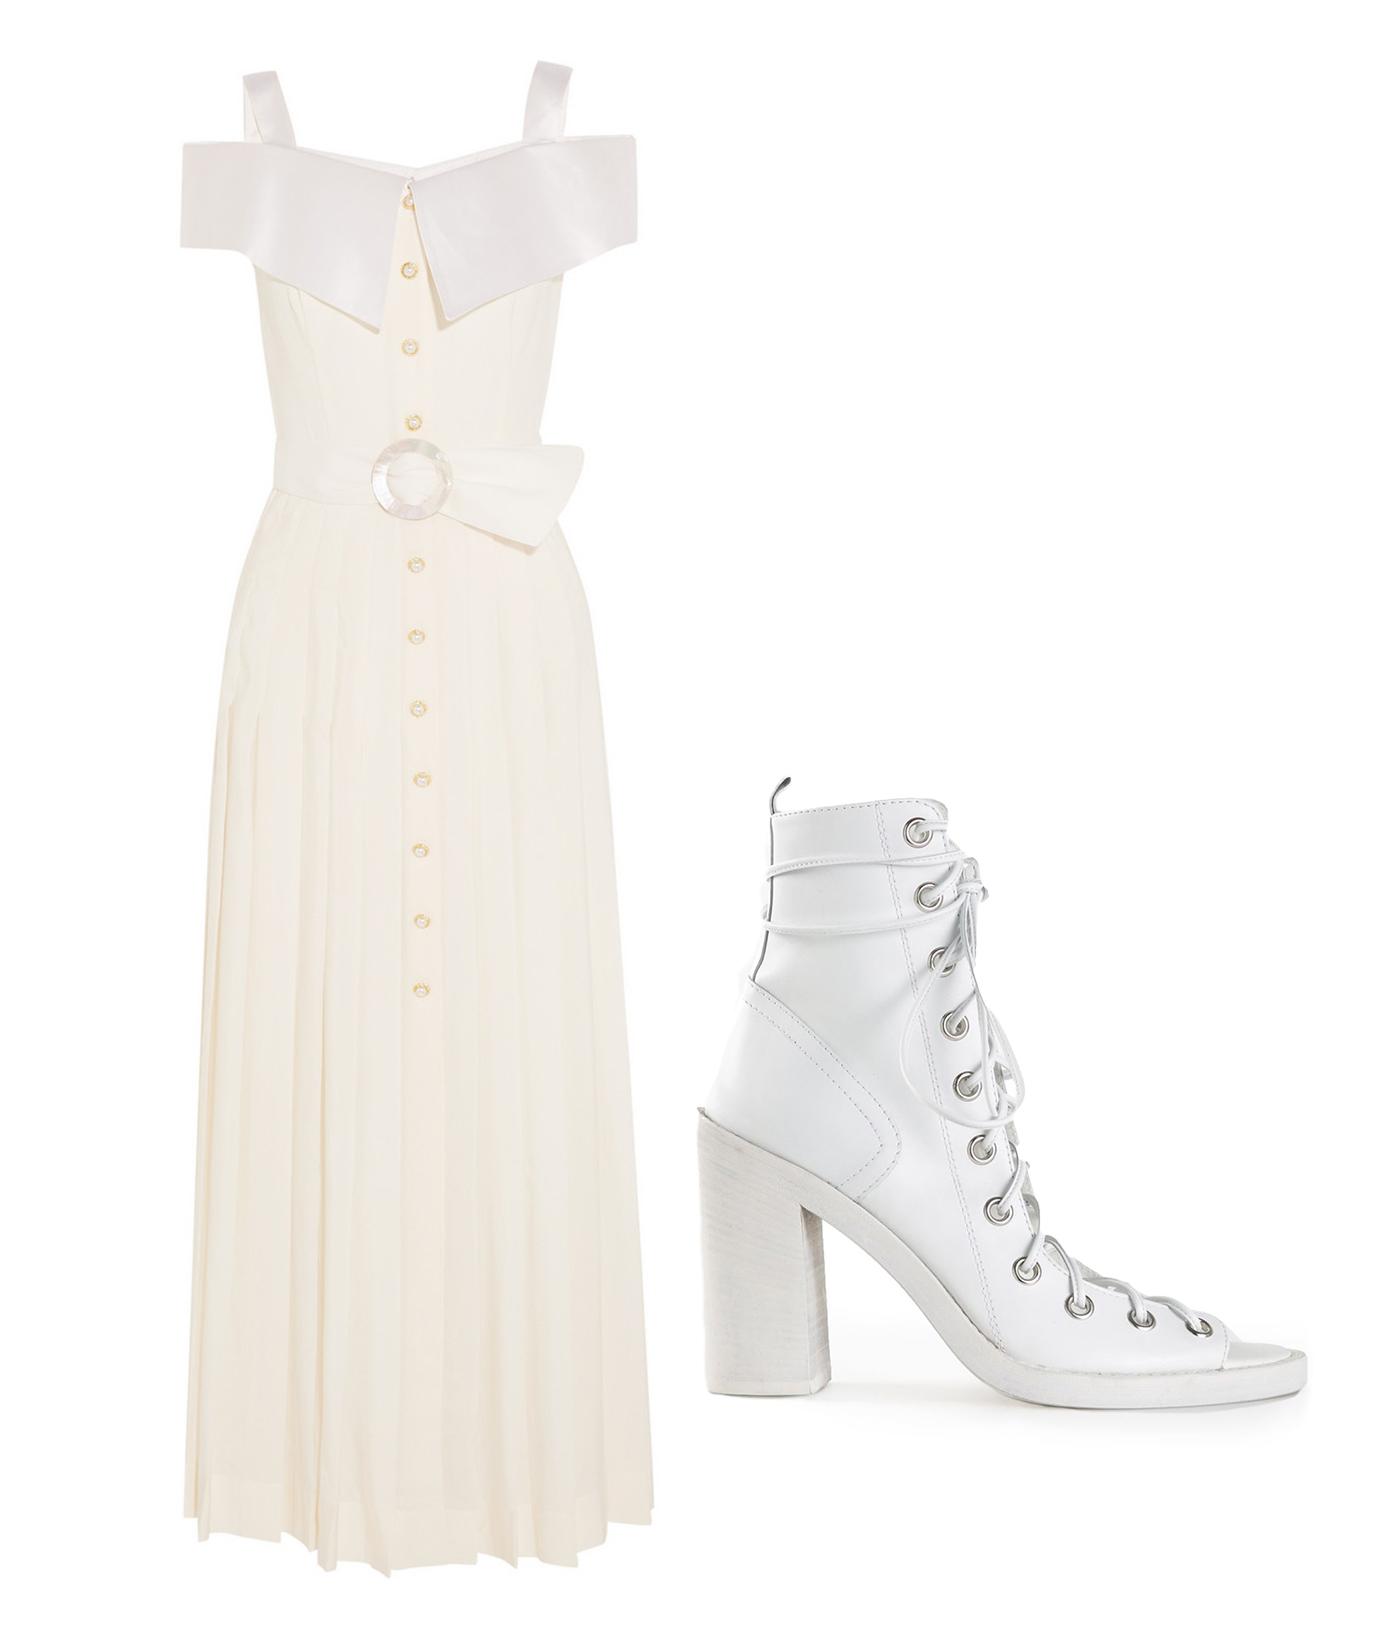 spring-wedding-dresses-accessories-32.jpg